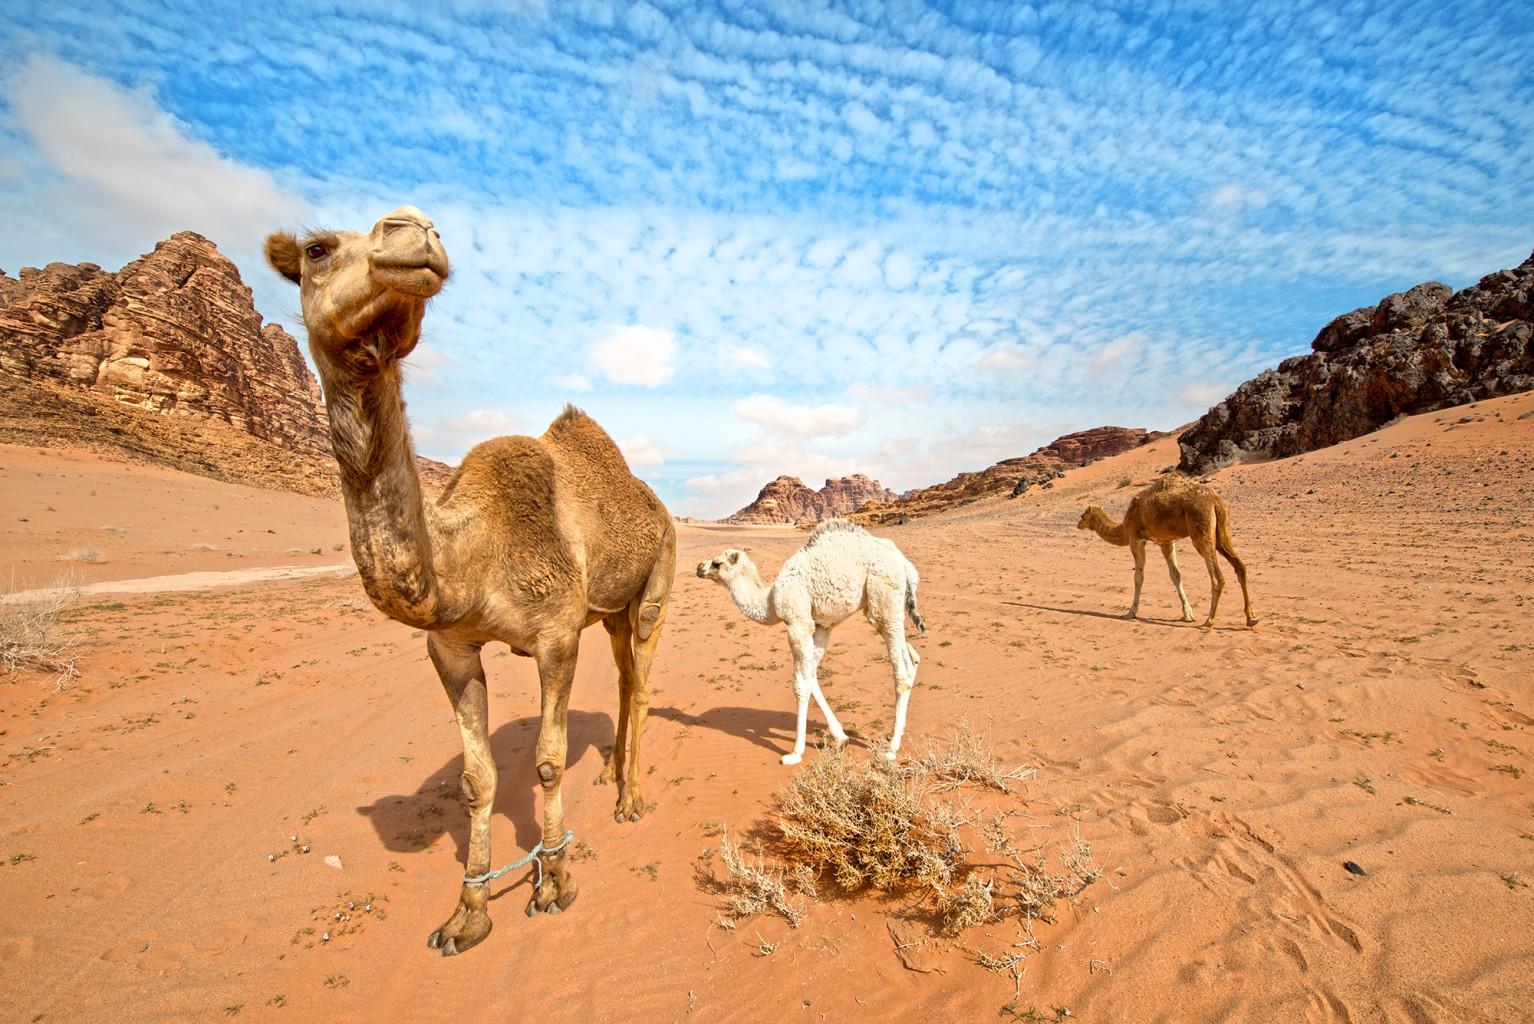 Wadi Rum Camels in the desert